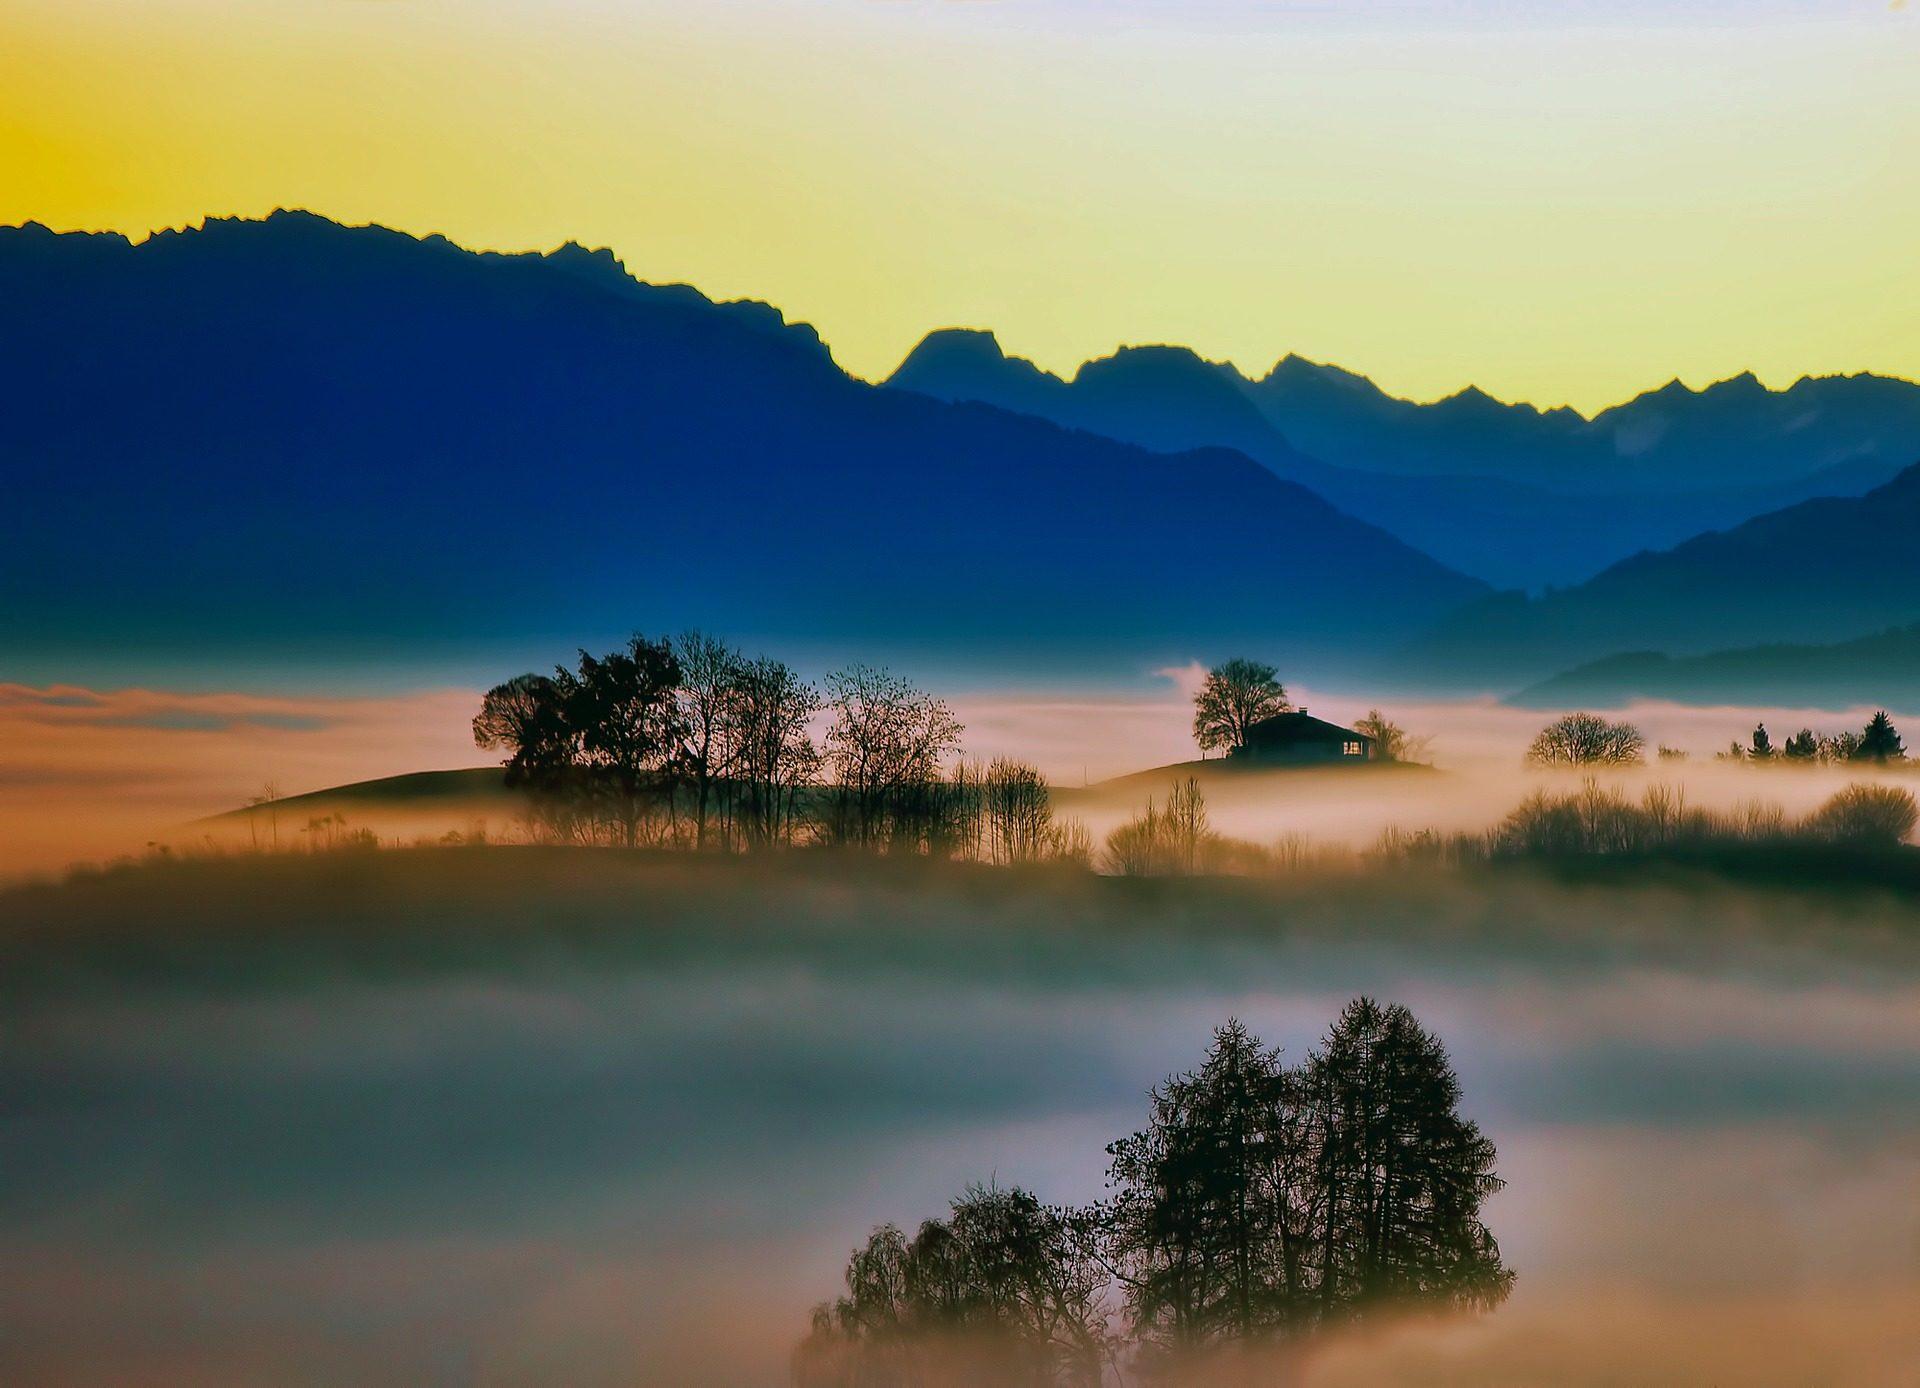 aube, brouillard, Montañas, humidité, arbres, silhouettes - Fonds d'écran HD - Professor-falken.com